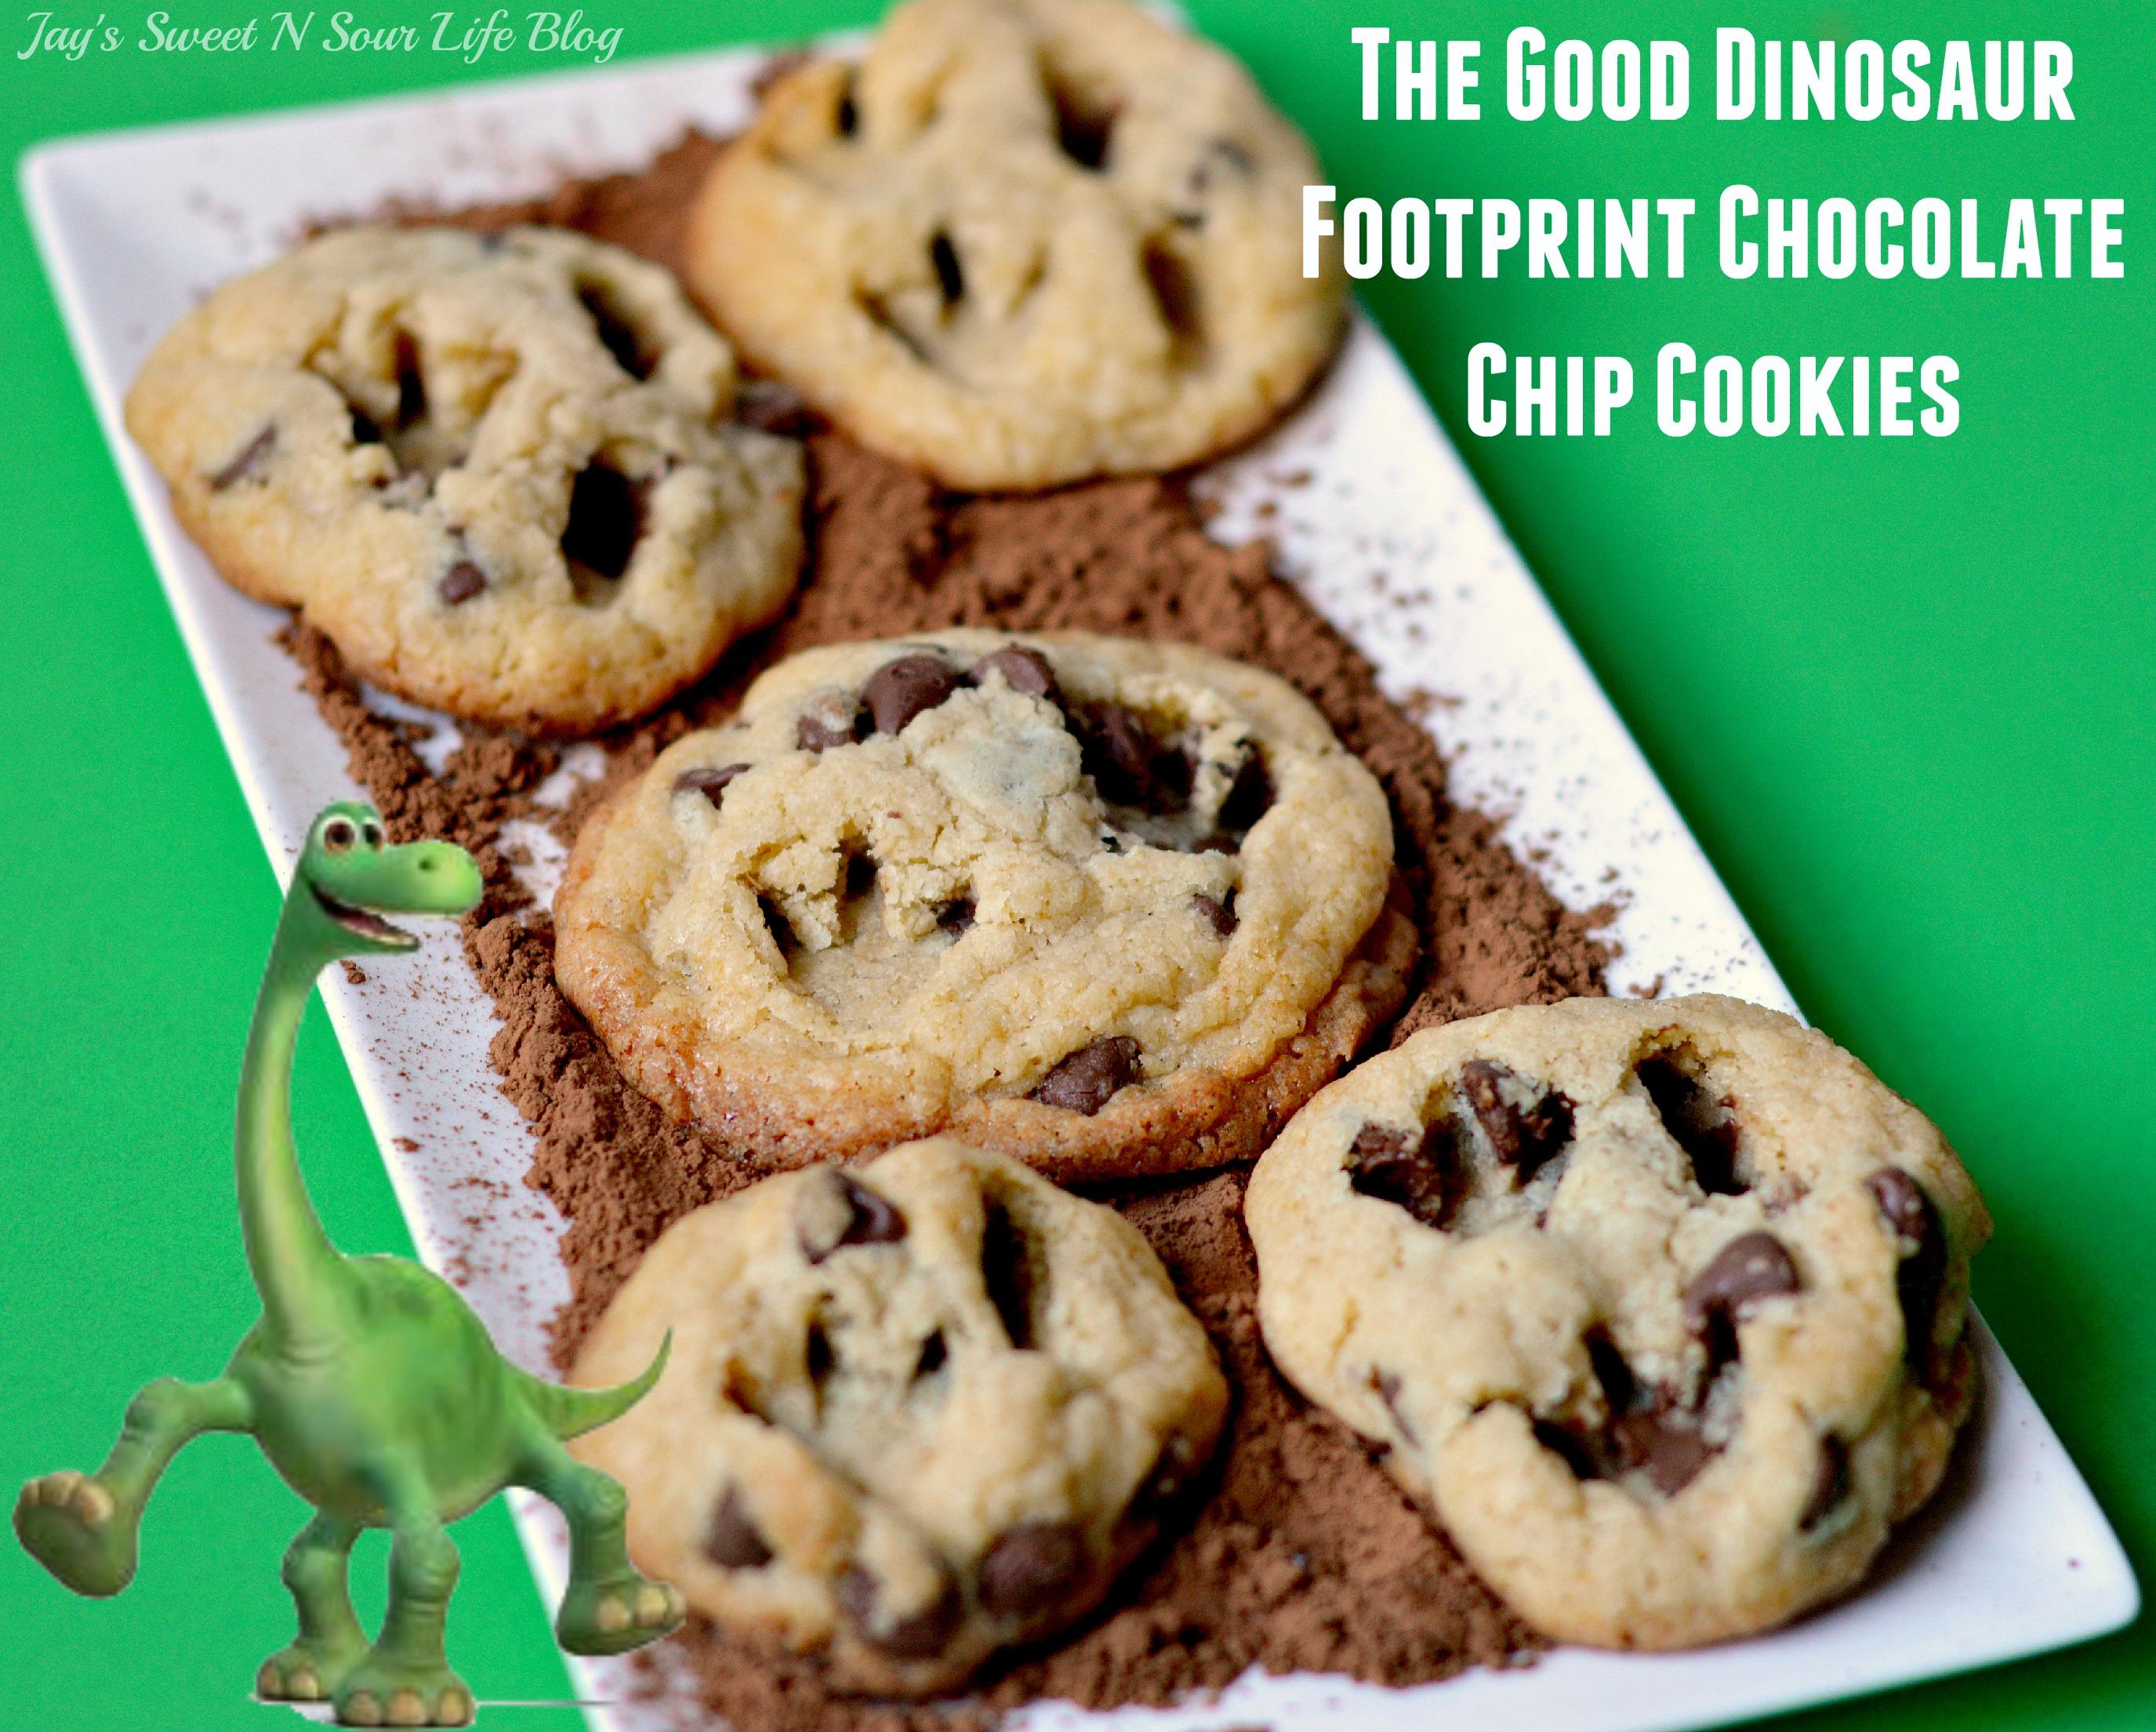 The Good Dinosaur Footprint Chocolate Chip Cookies